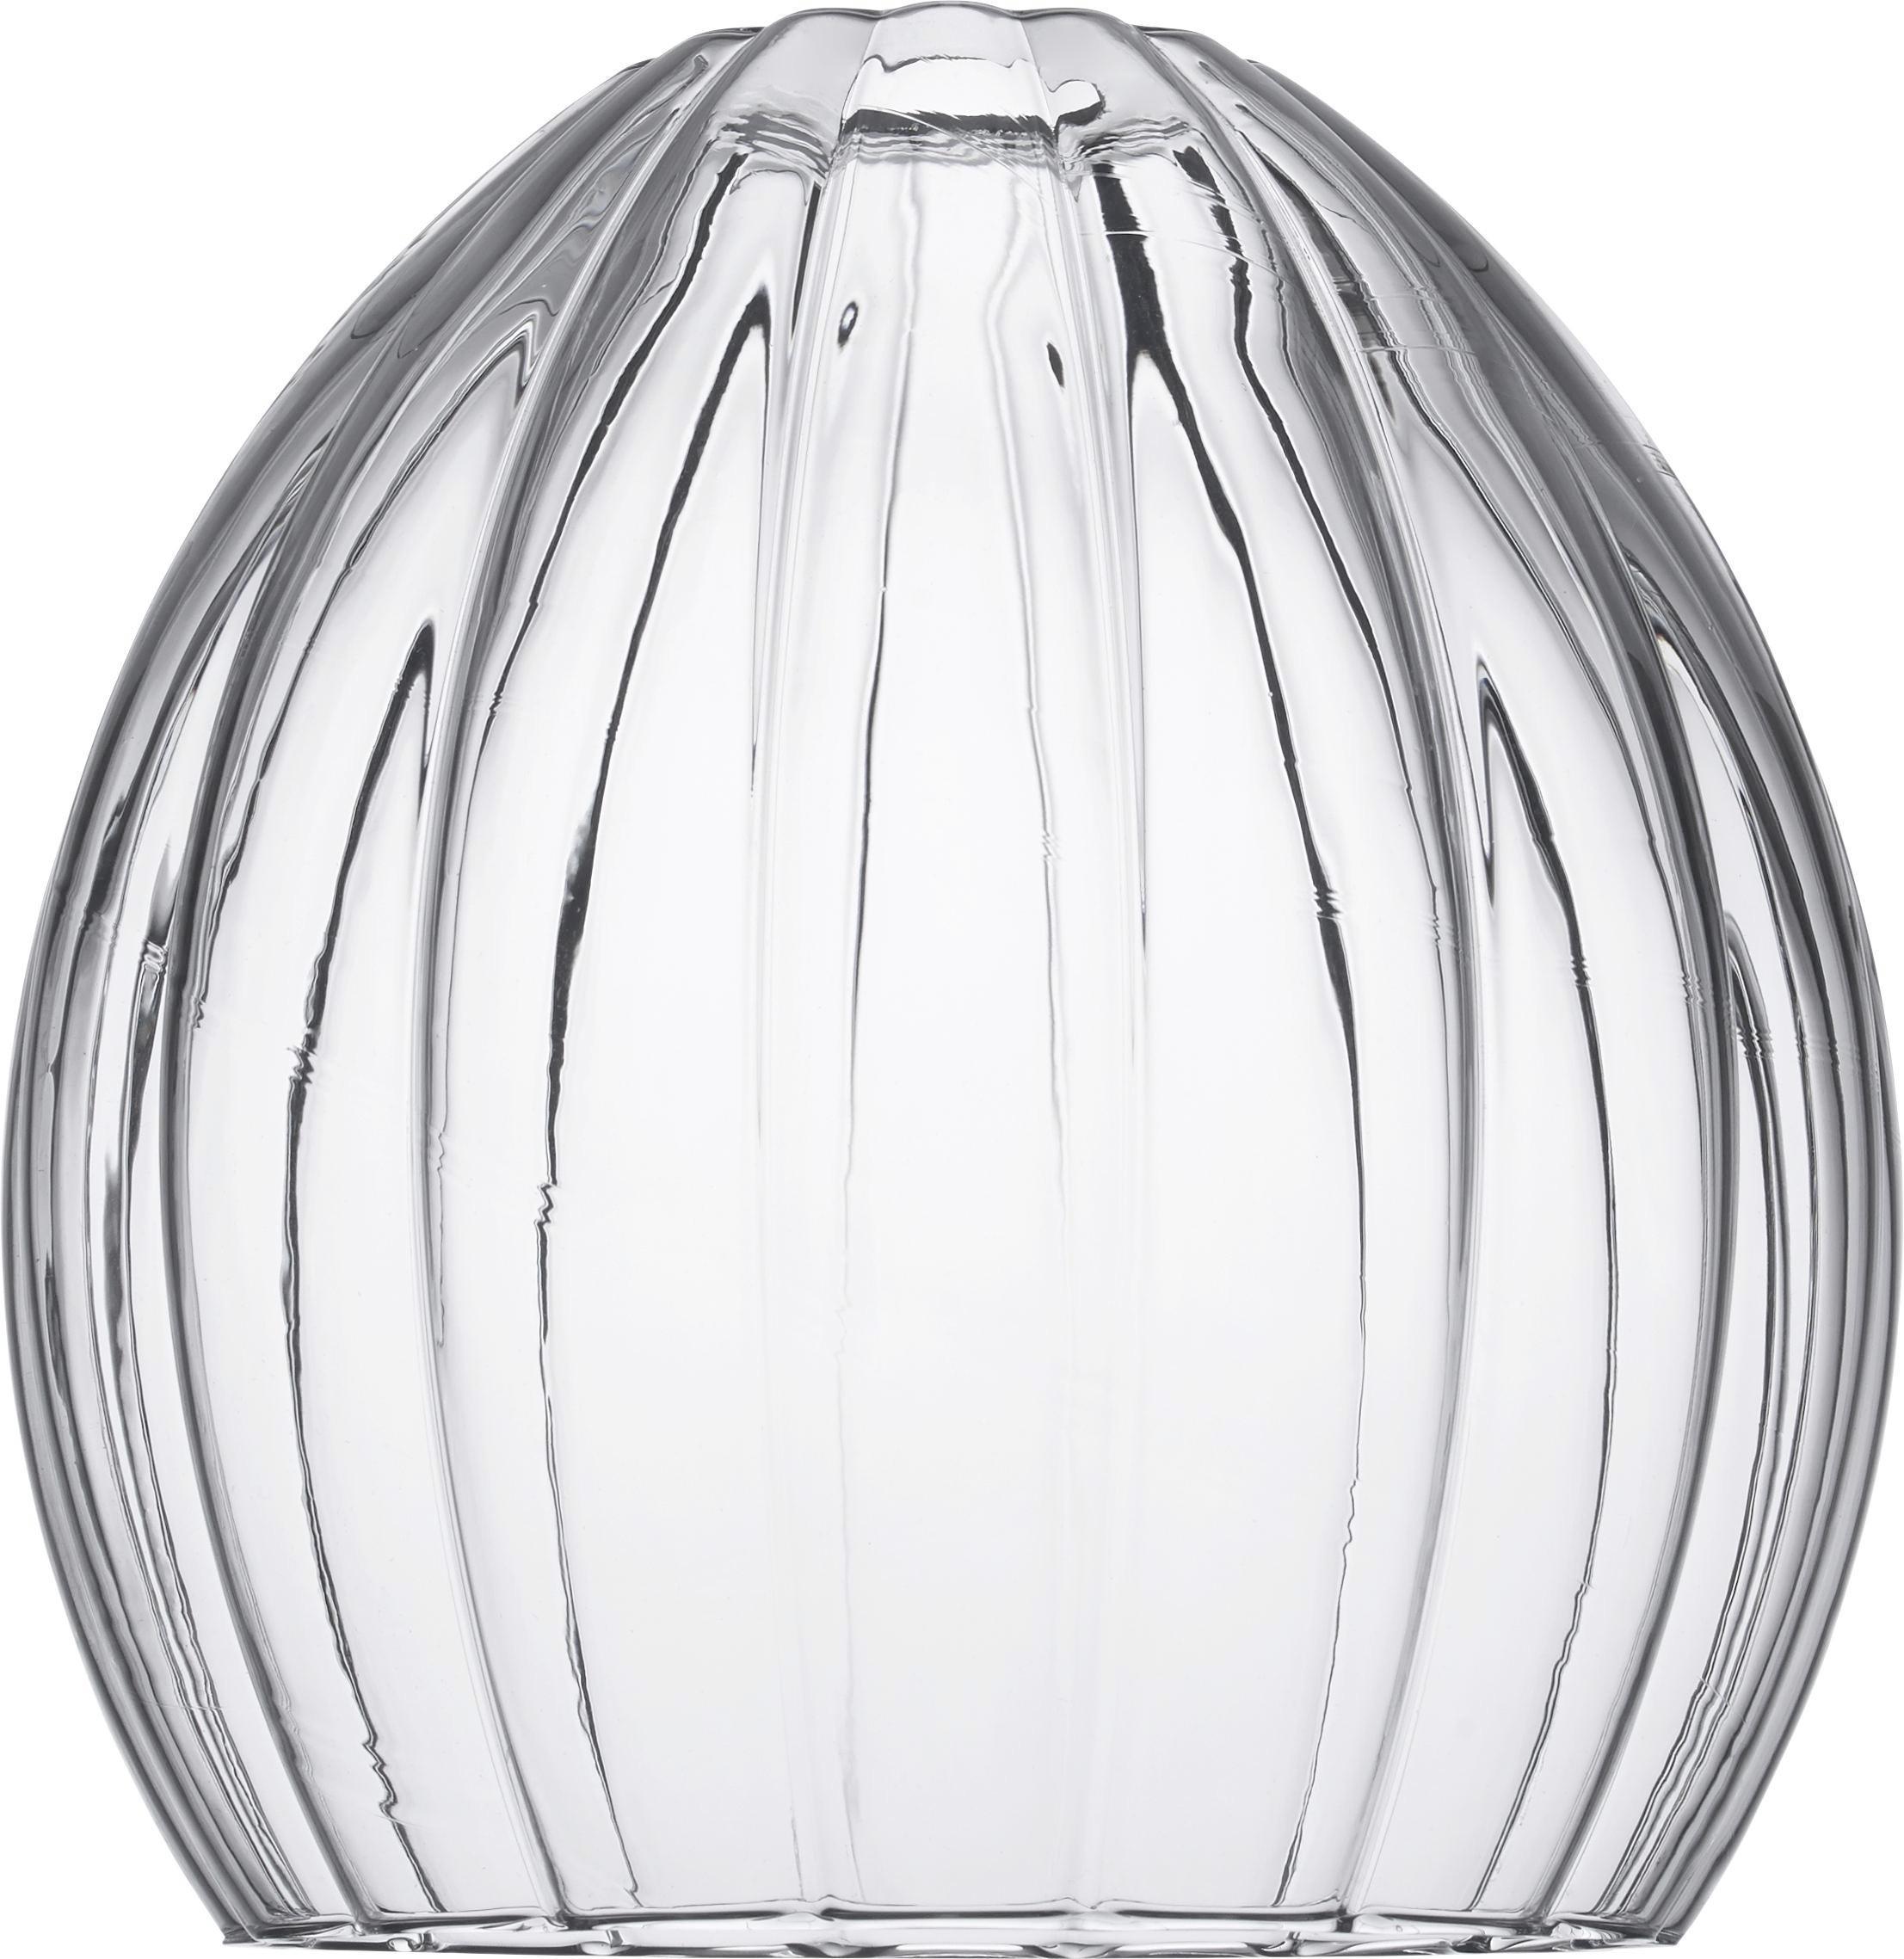 Leuchtenschirm Else aus Glas - Transparent, Glas (25/26cm) - MÖMAX modern living